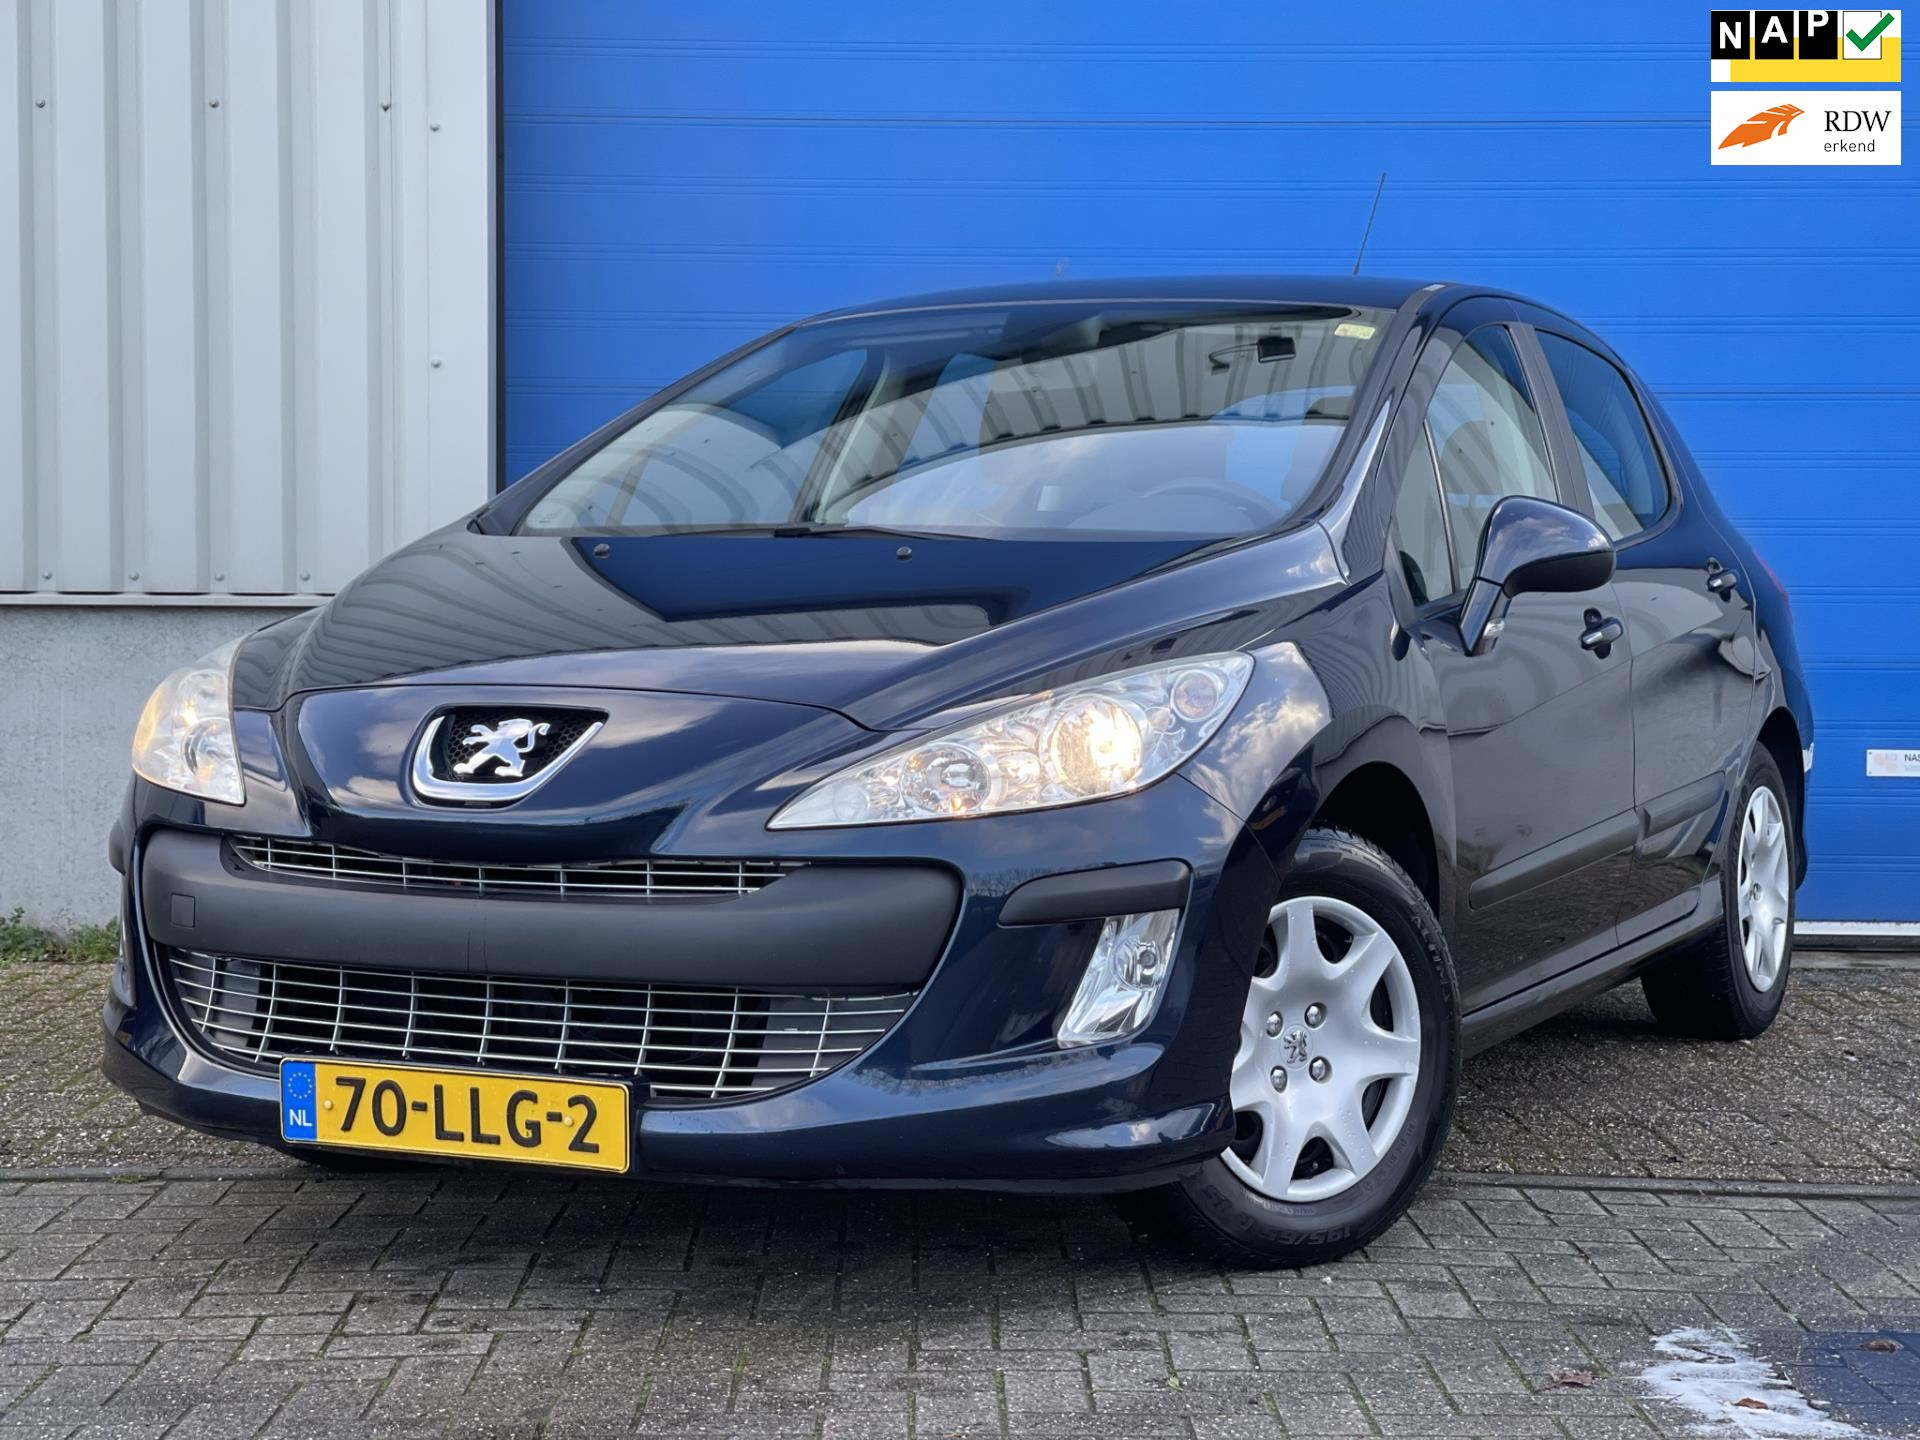 Peugeot 308 1.6 VTi 16V occasion - Autohandel Hulst